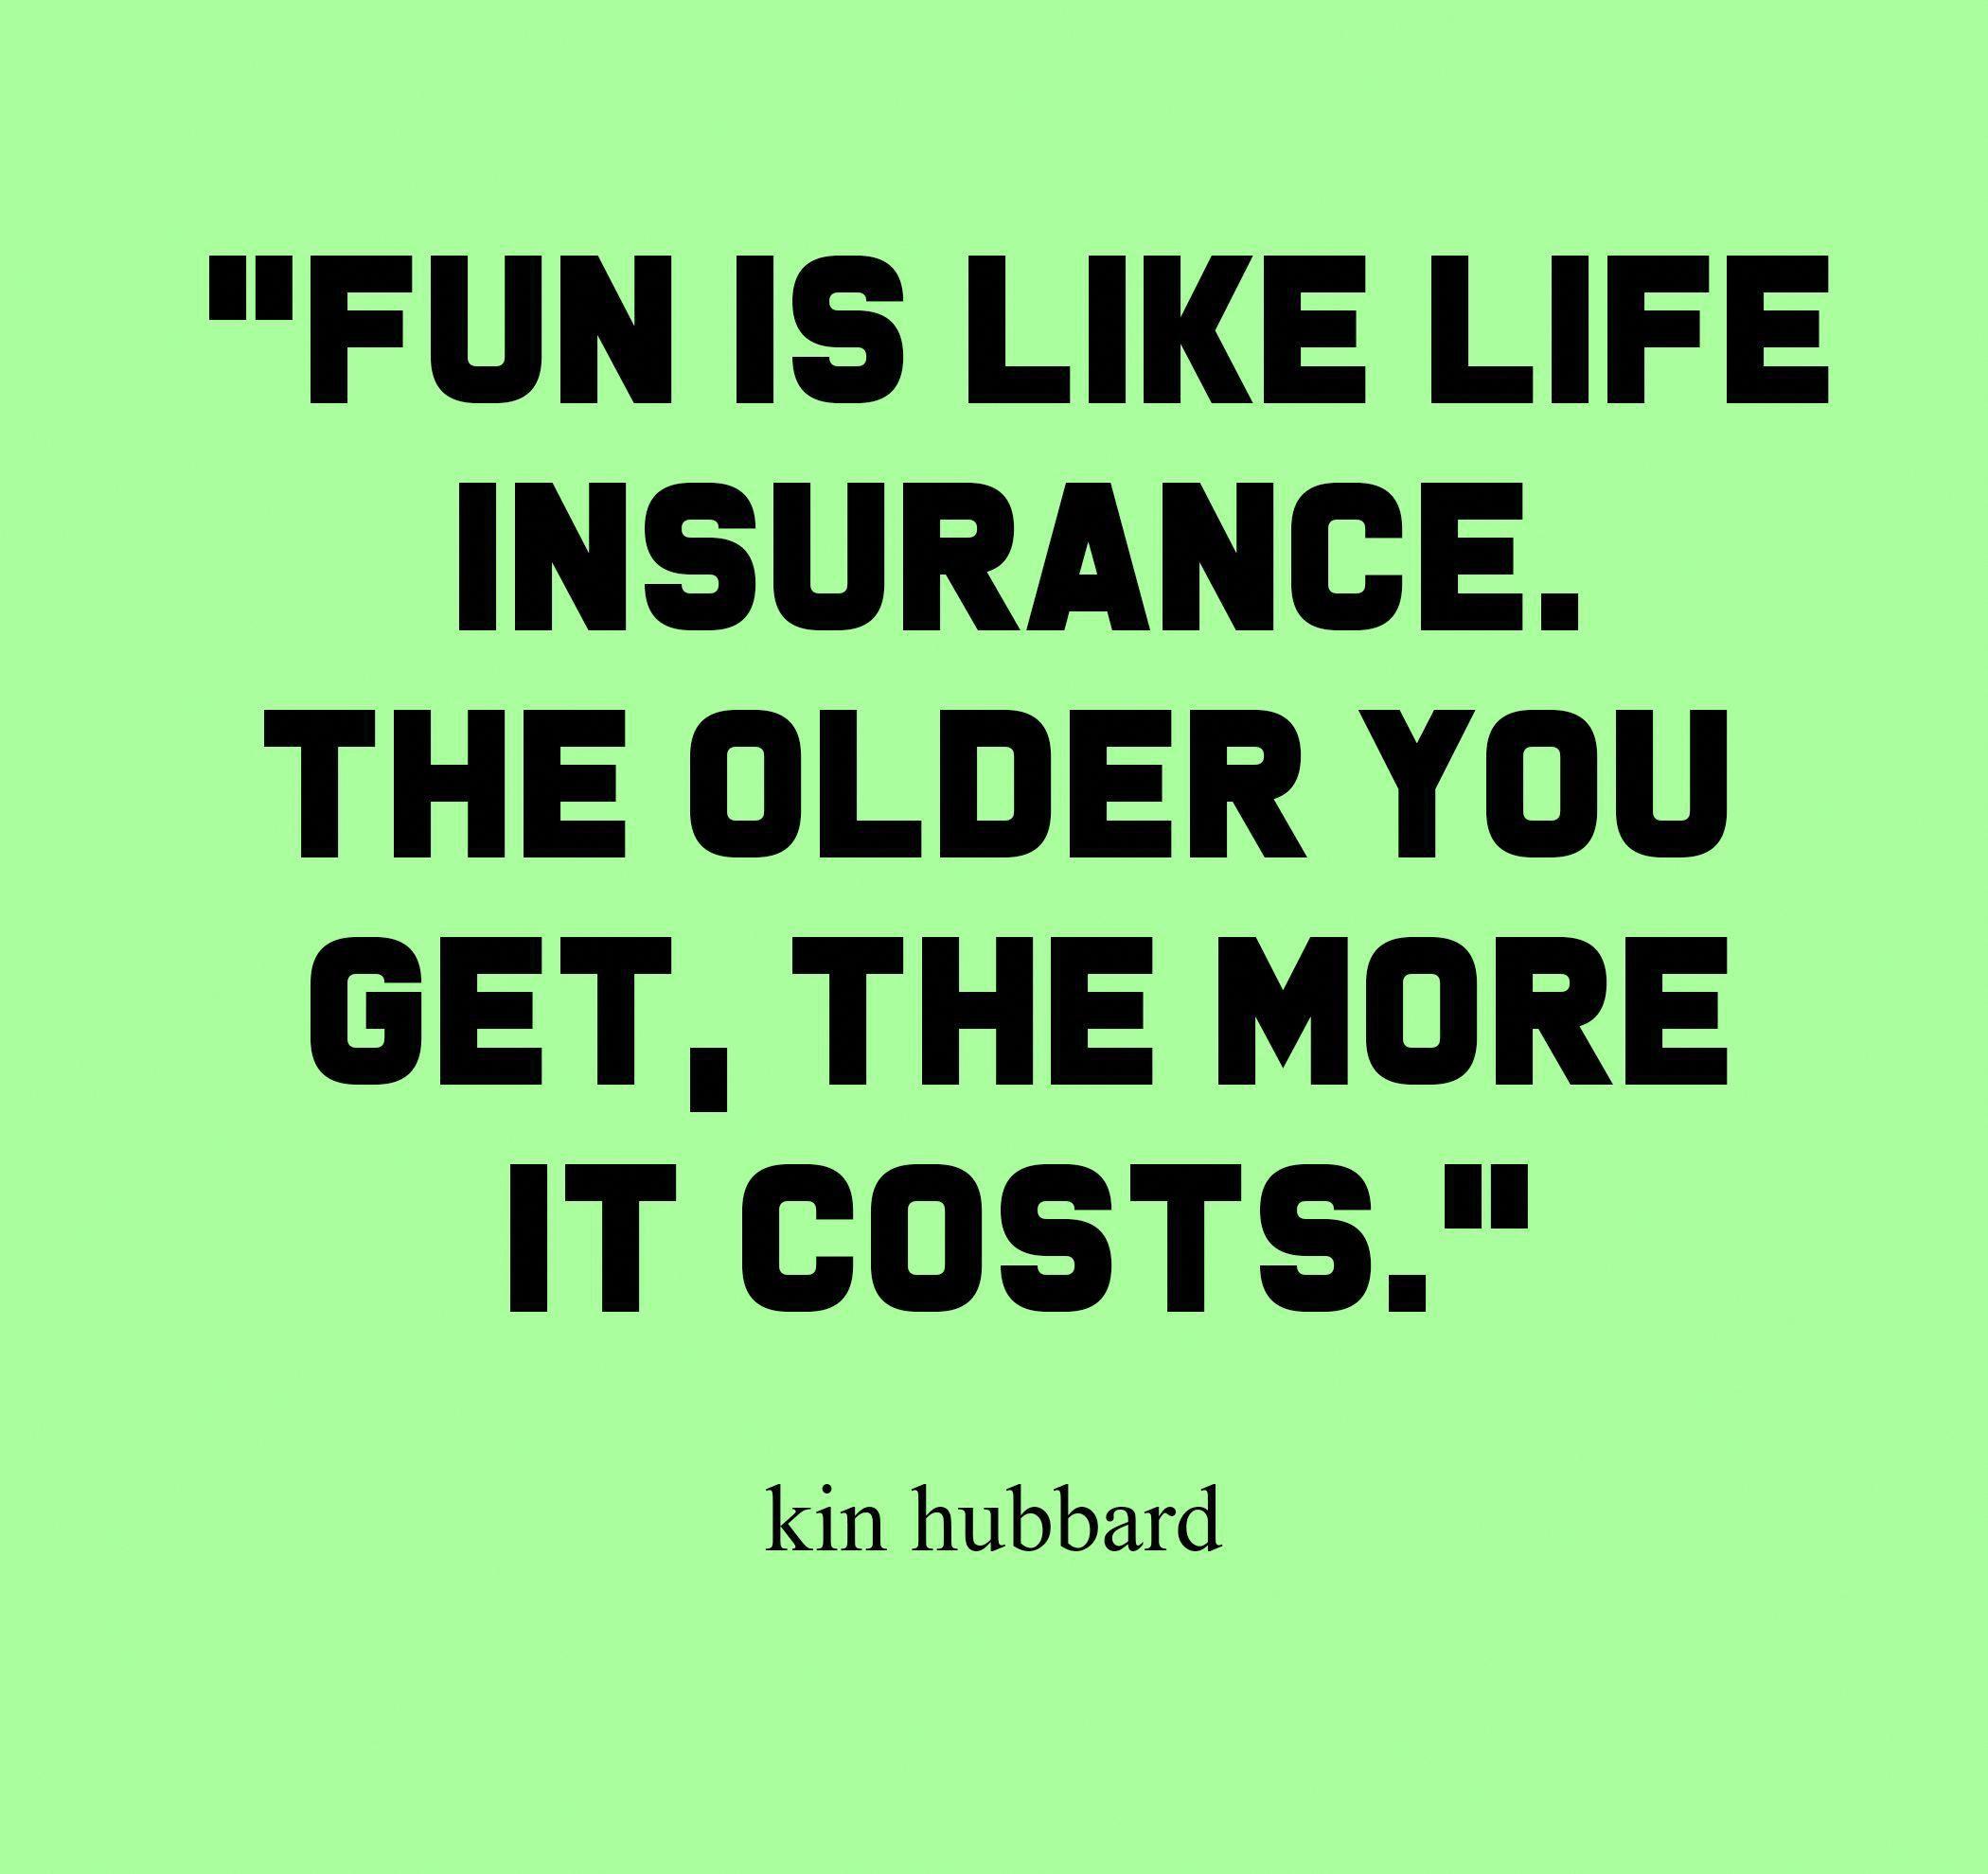 Life Insurance Humor Funny Insurance Agents Social Media